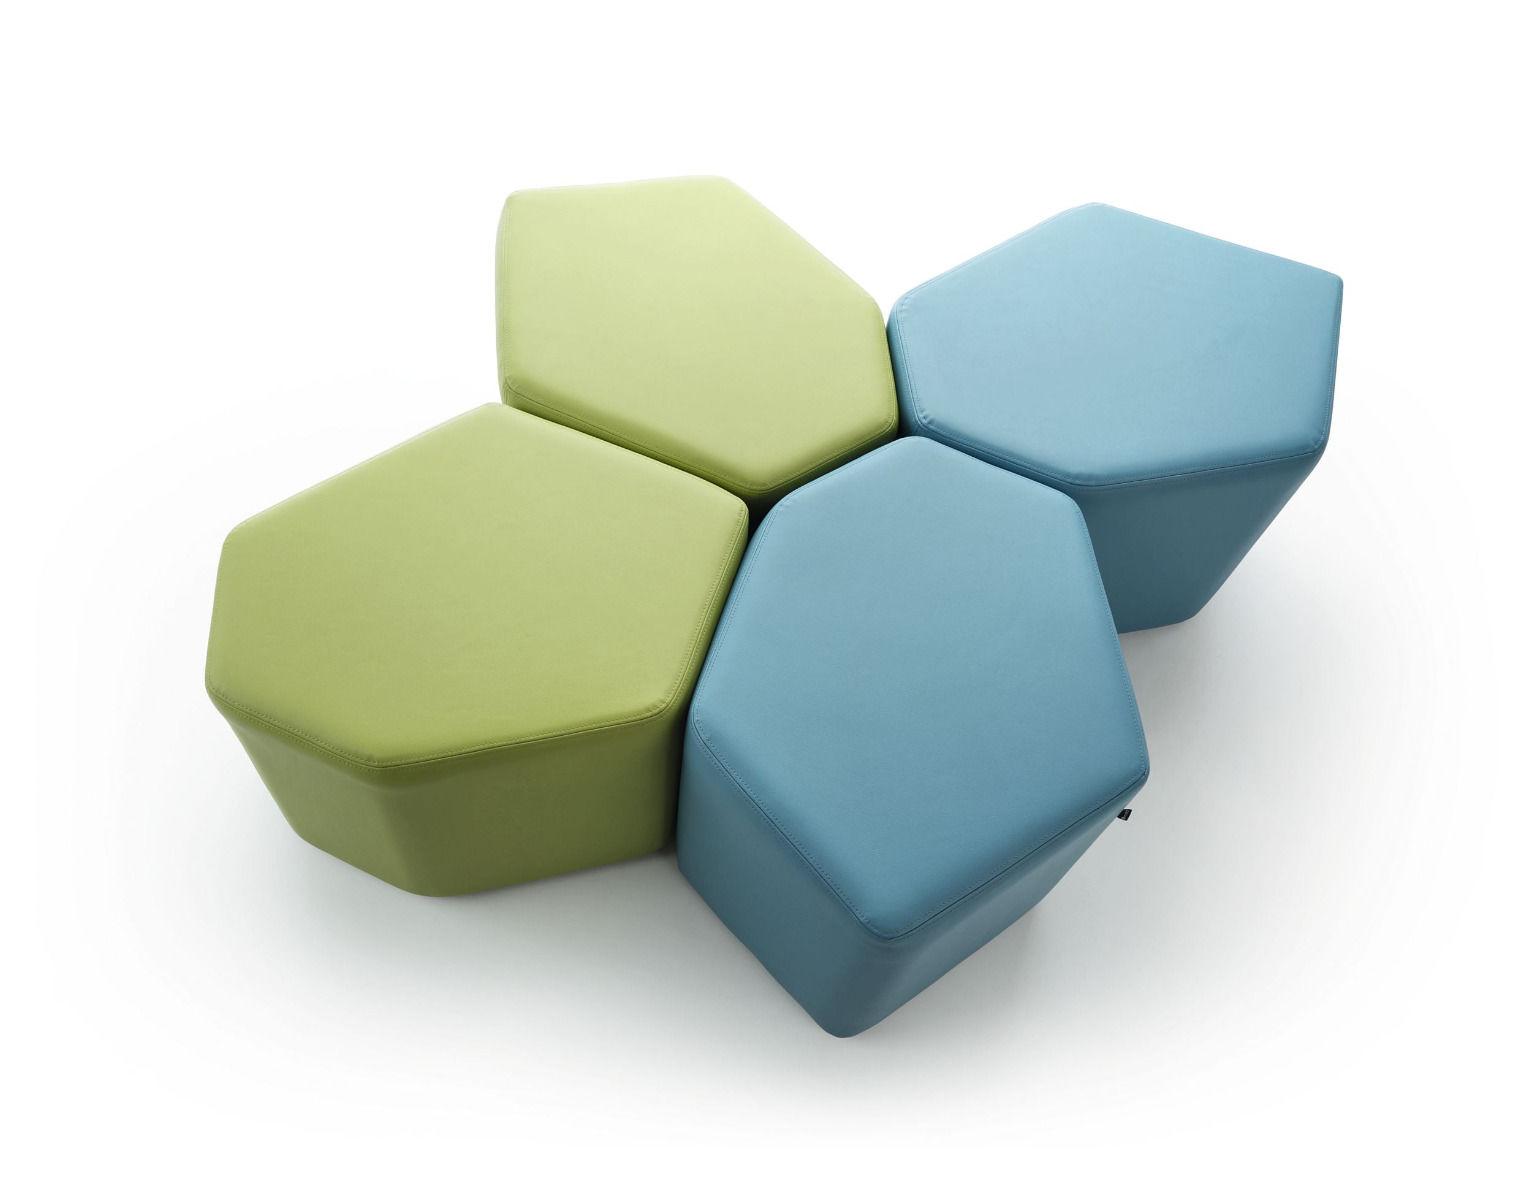 empfangstheken-sitzmoebel-lounge-museum-hellblau-hellblau-gruen